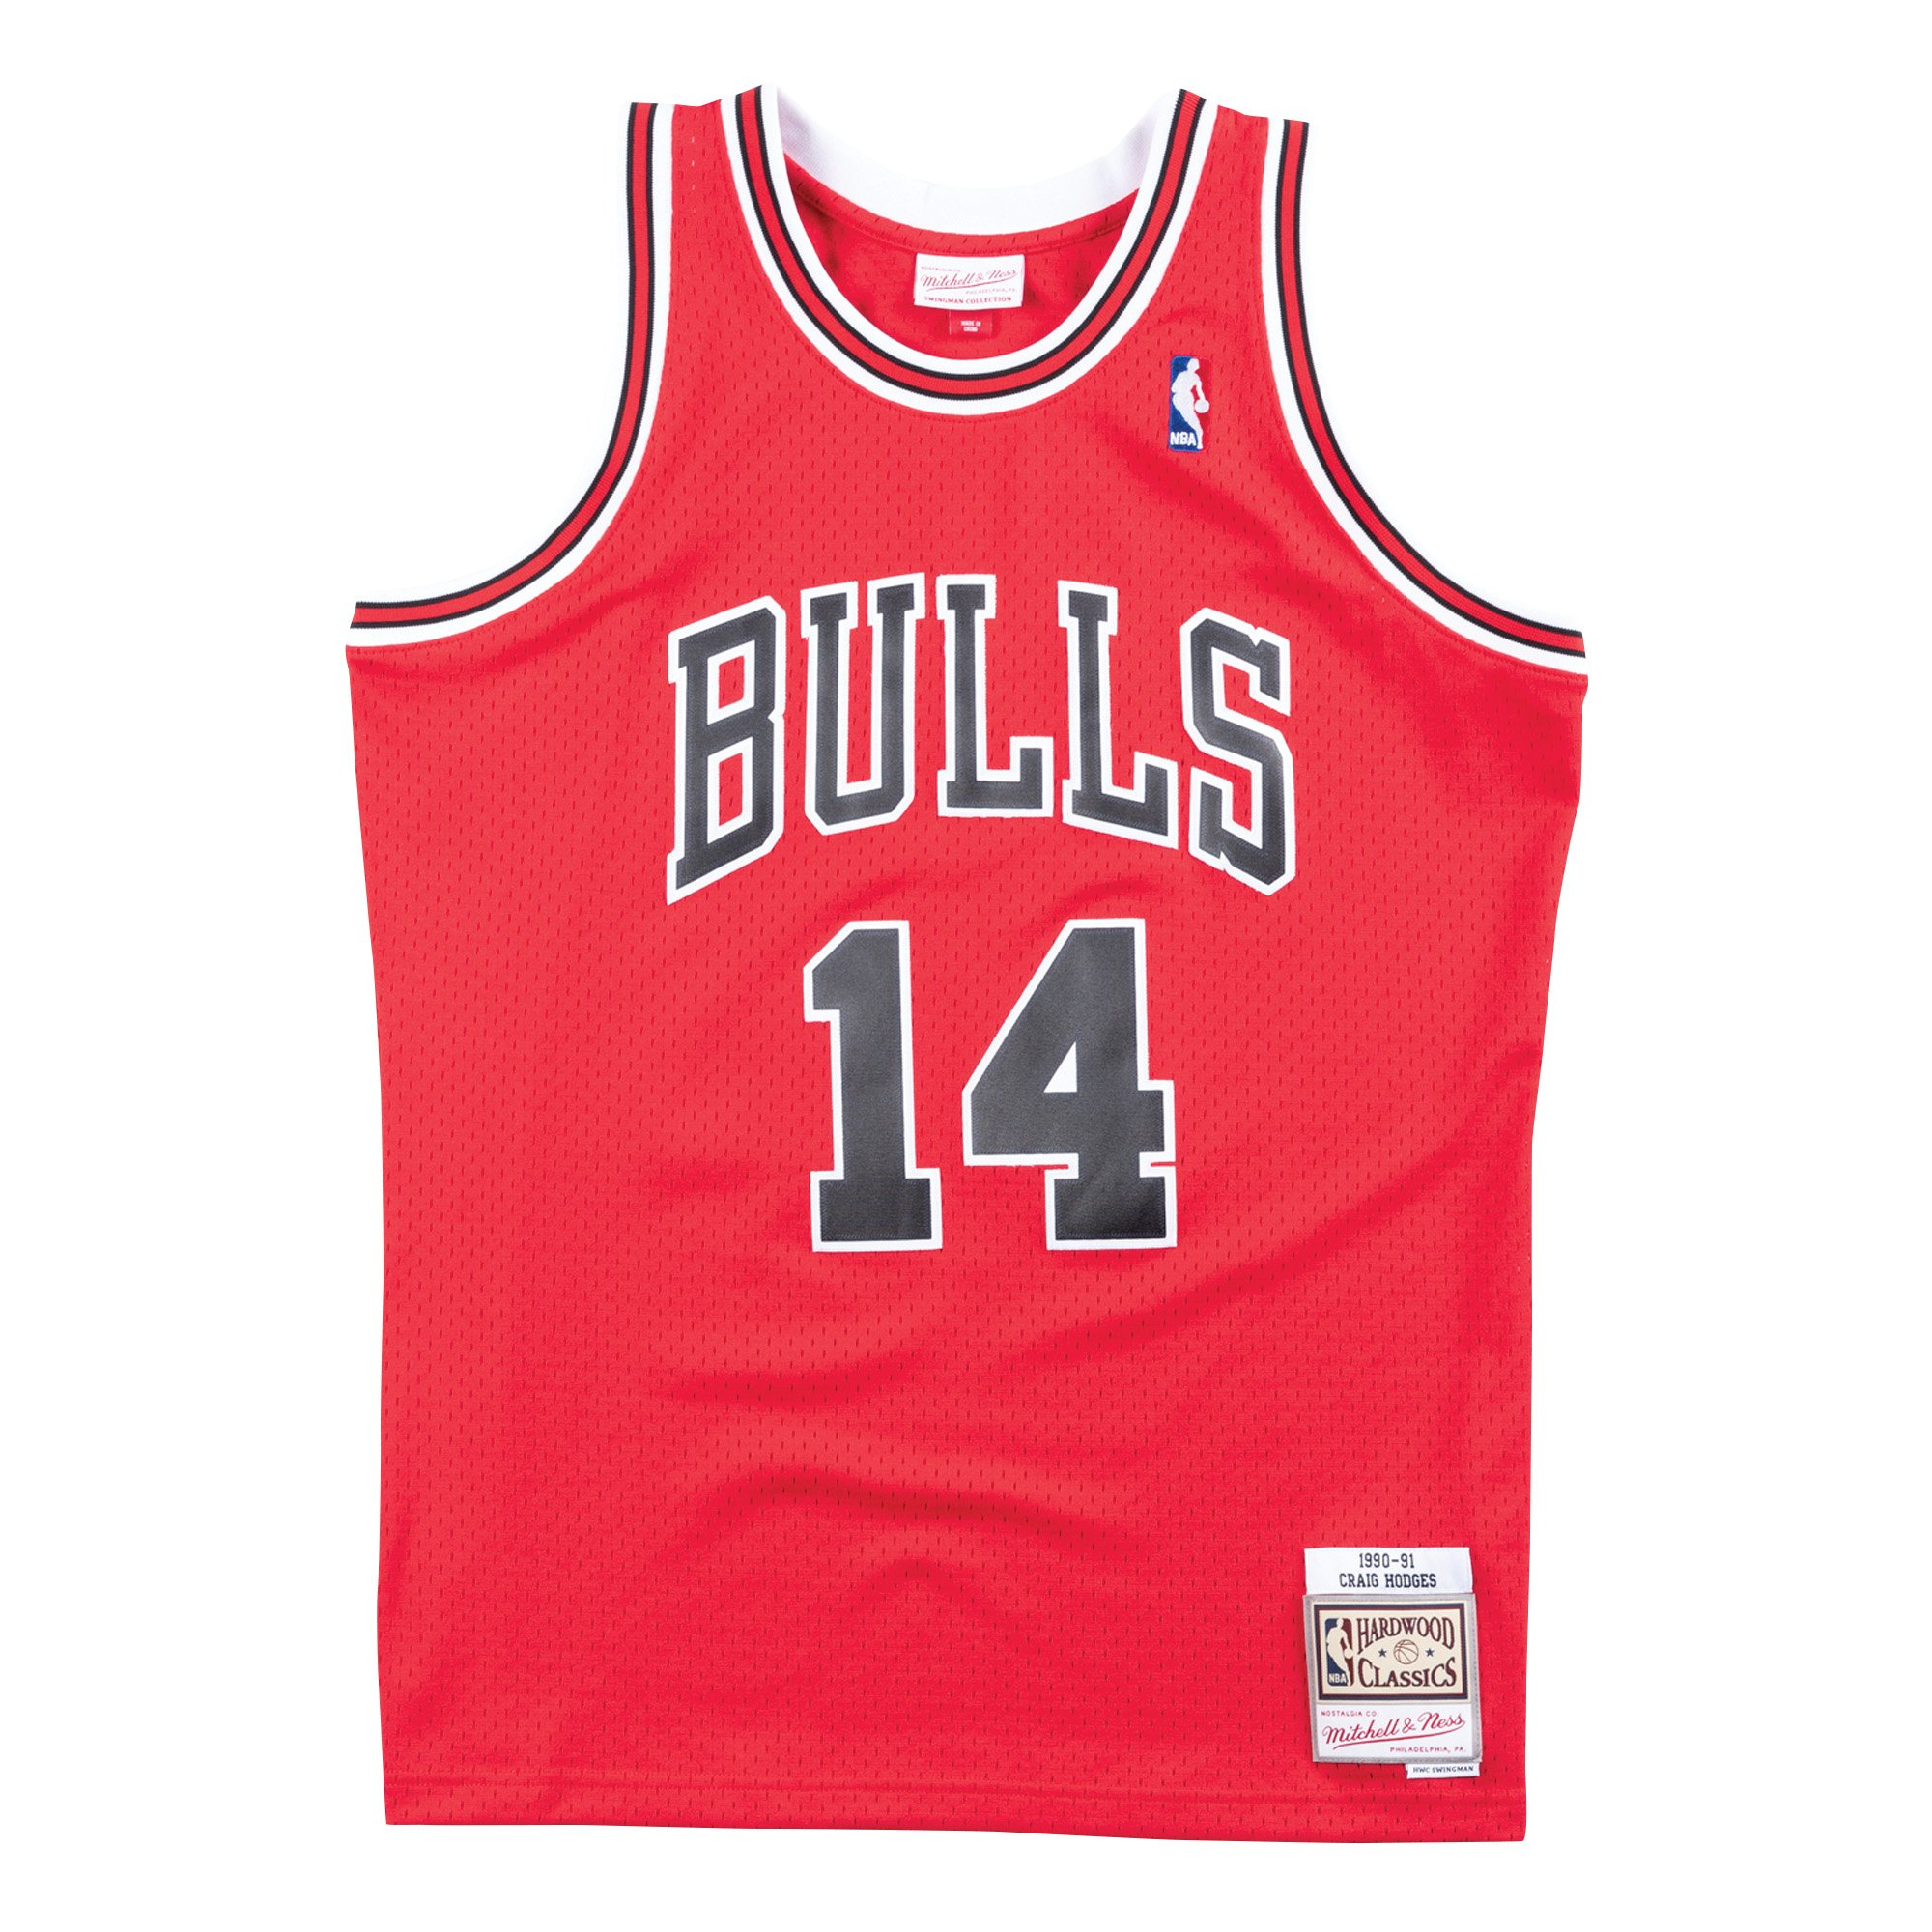 cheap hockey jerseys custom Mitchell & Ness Craig Hodges Chicago Bulls Hardwood Classic Throwback NBA Swingman Jersey where to purchase nba jerseys